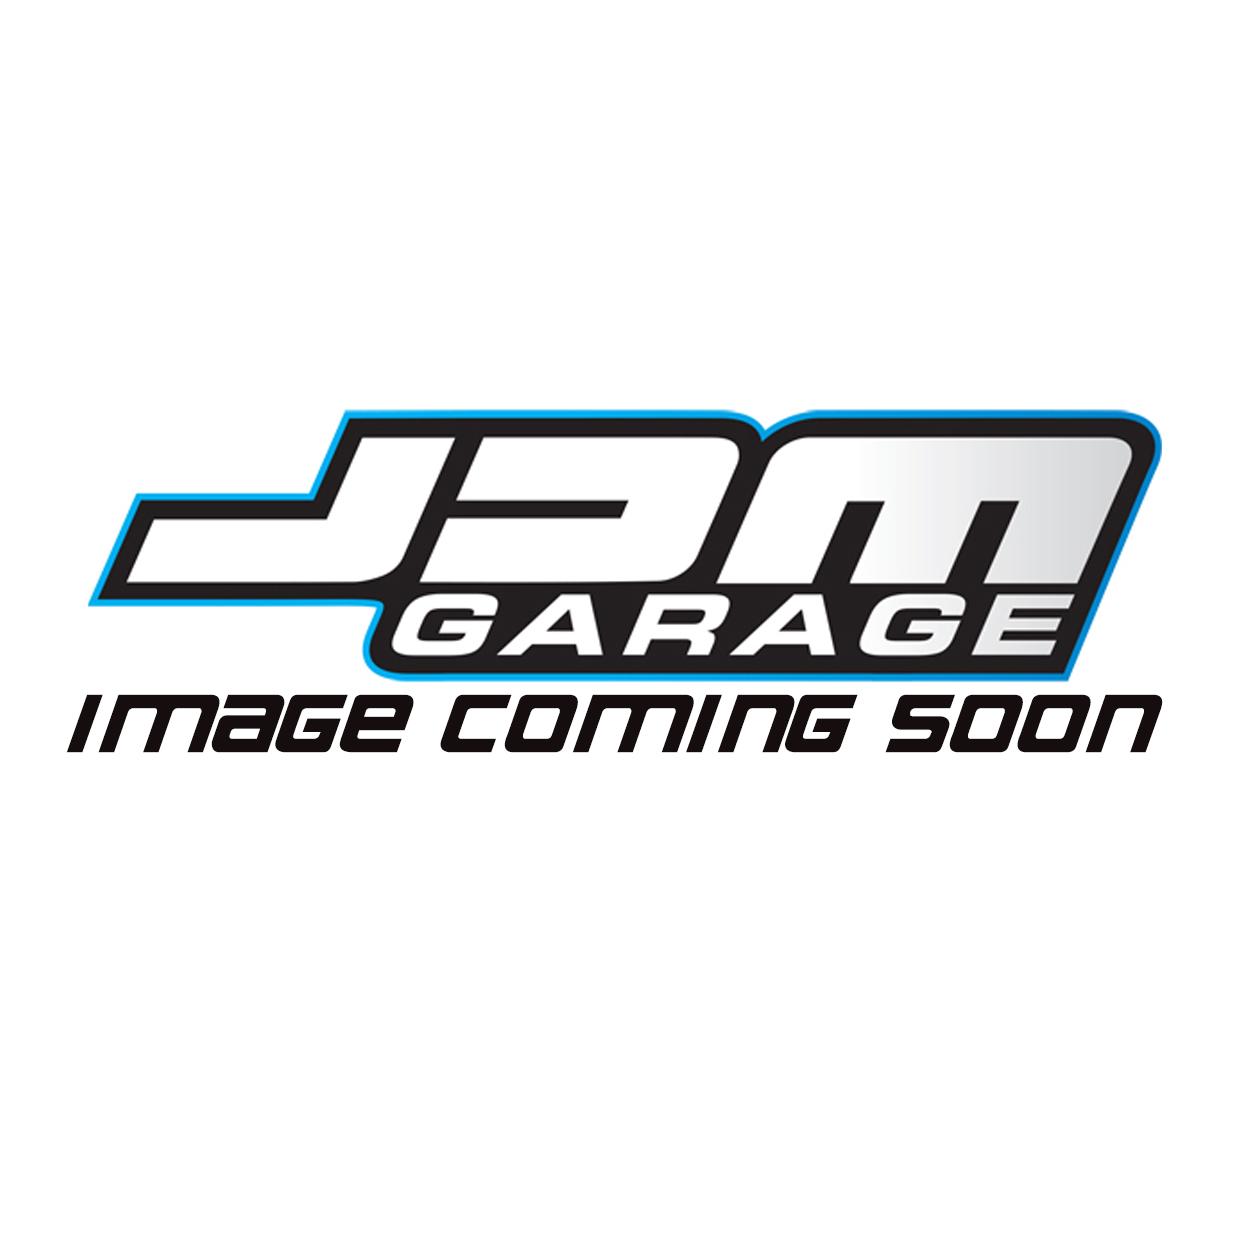 Genuine Nissan Pitworks Rear Brake Seal Kit for Nissan Skyline R34 GT Stagea WC34 RB20DE RB25DE AY620-NS020